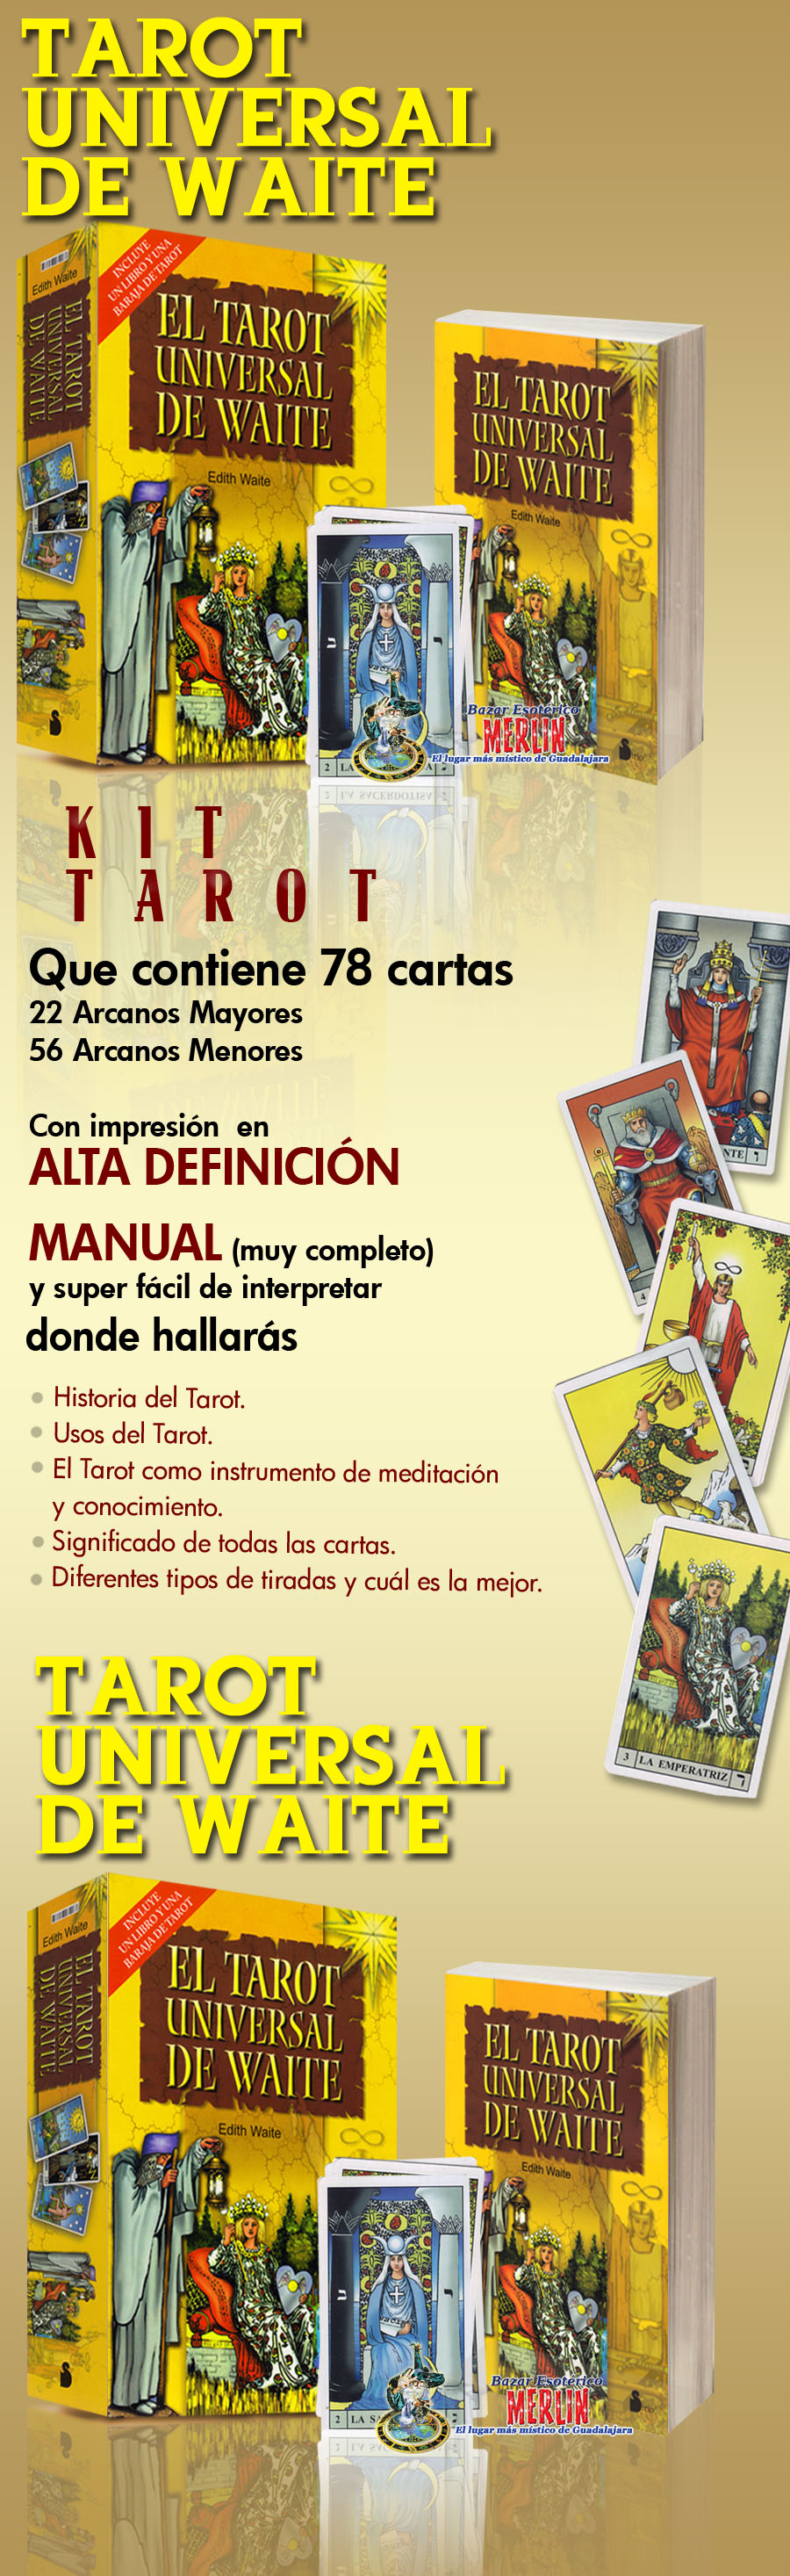 Tarot Universal De Waite Diseno 01